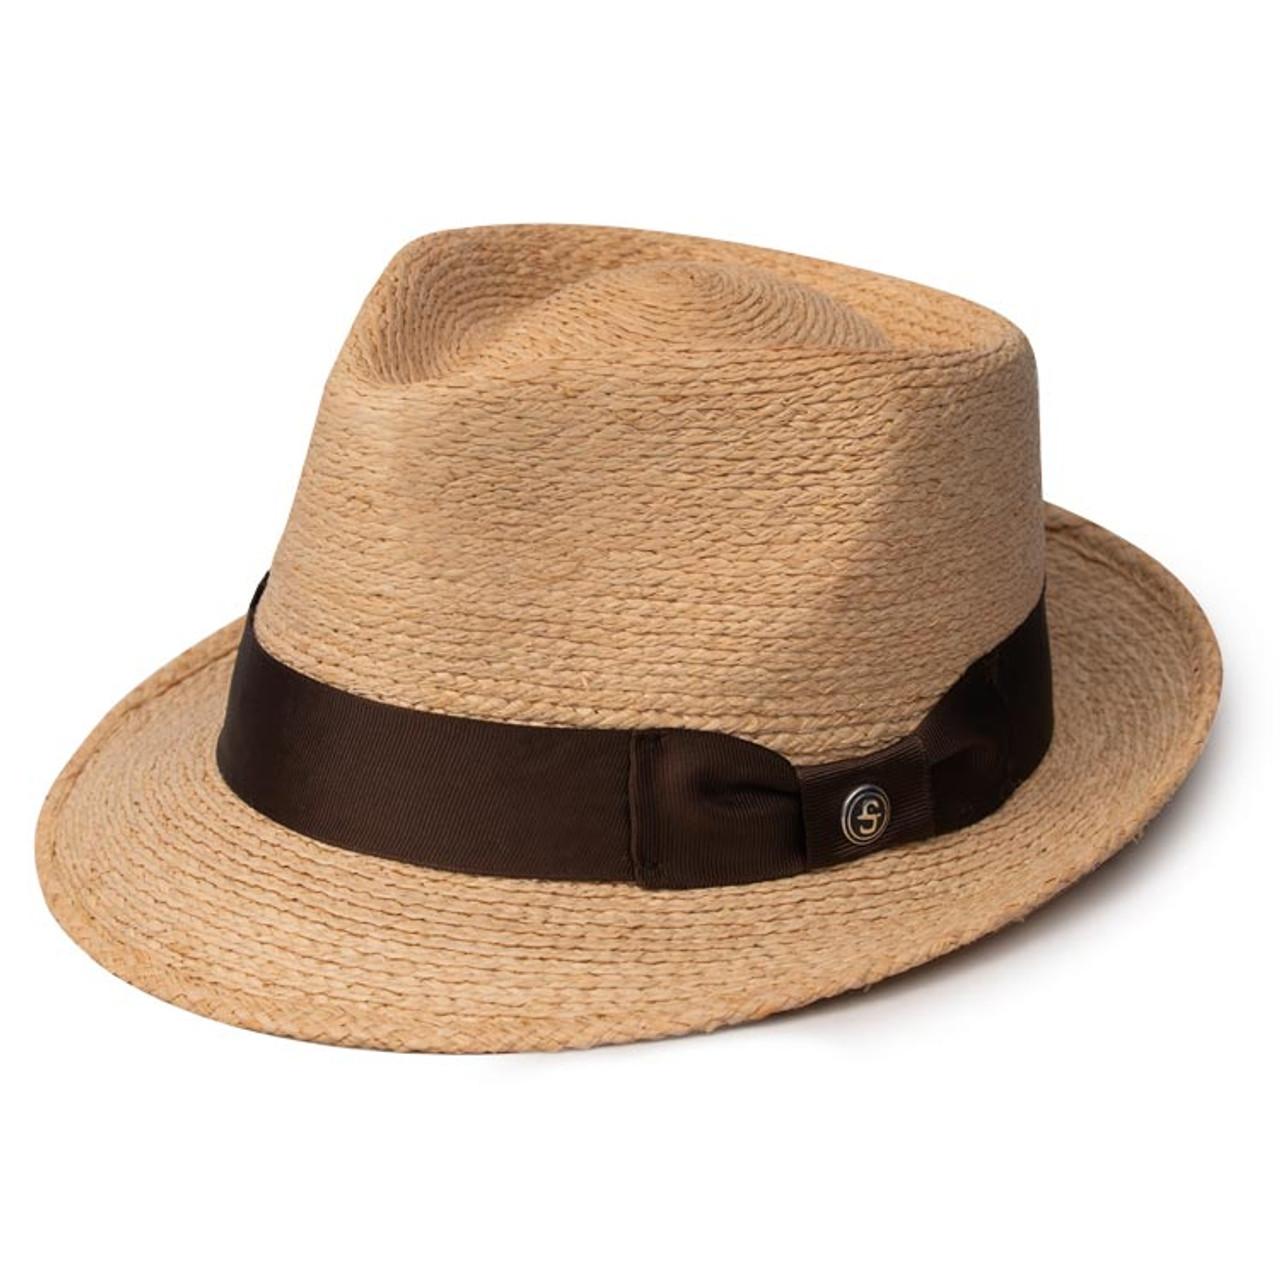 4bae495ca07f25 Stetson | 42nd Street Fedora | Hats Unlimited